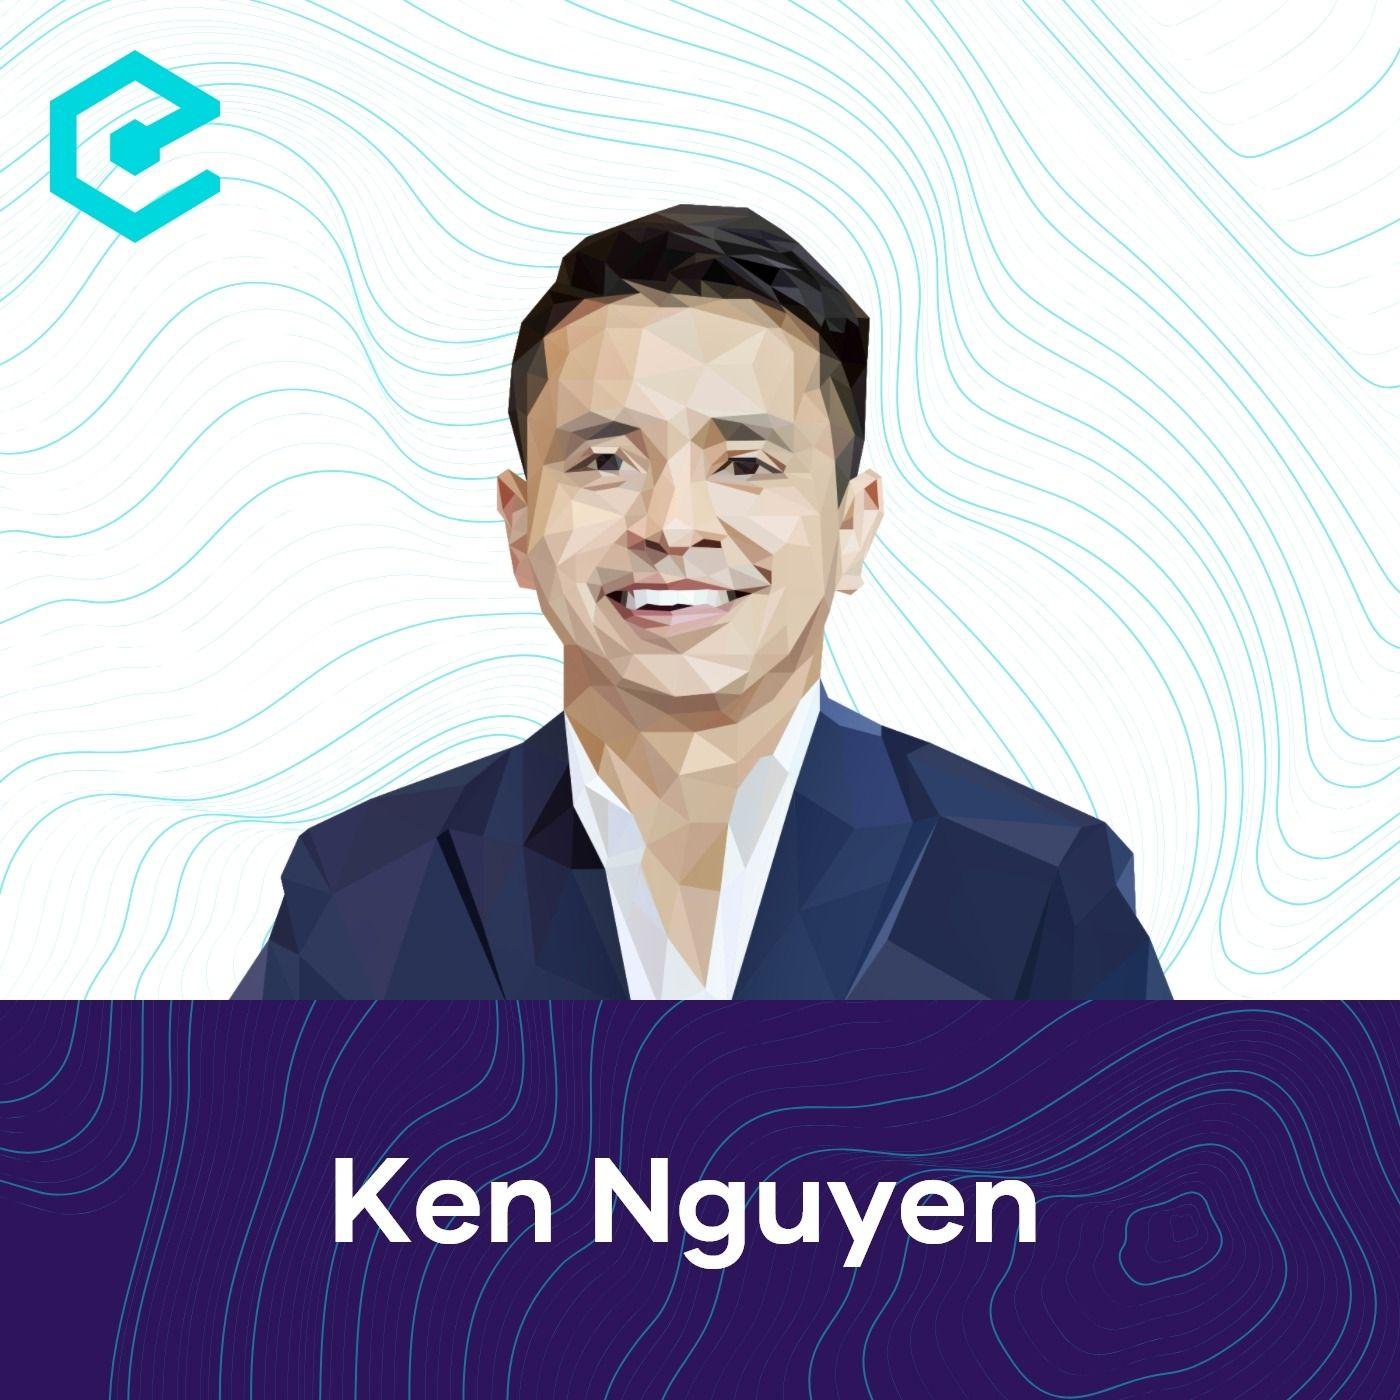 Ken Nguyen: Republic – Bridging the Gap Between Investing and Startups